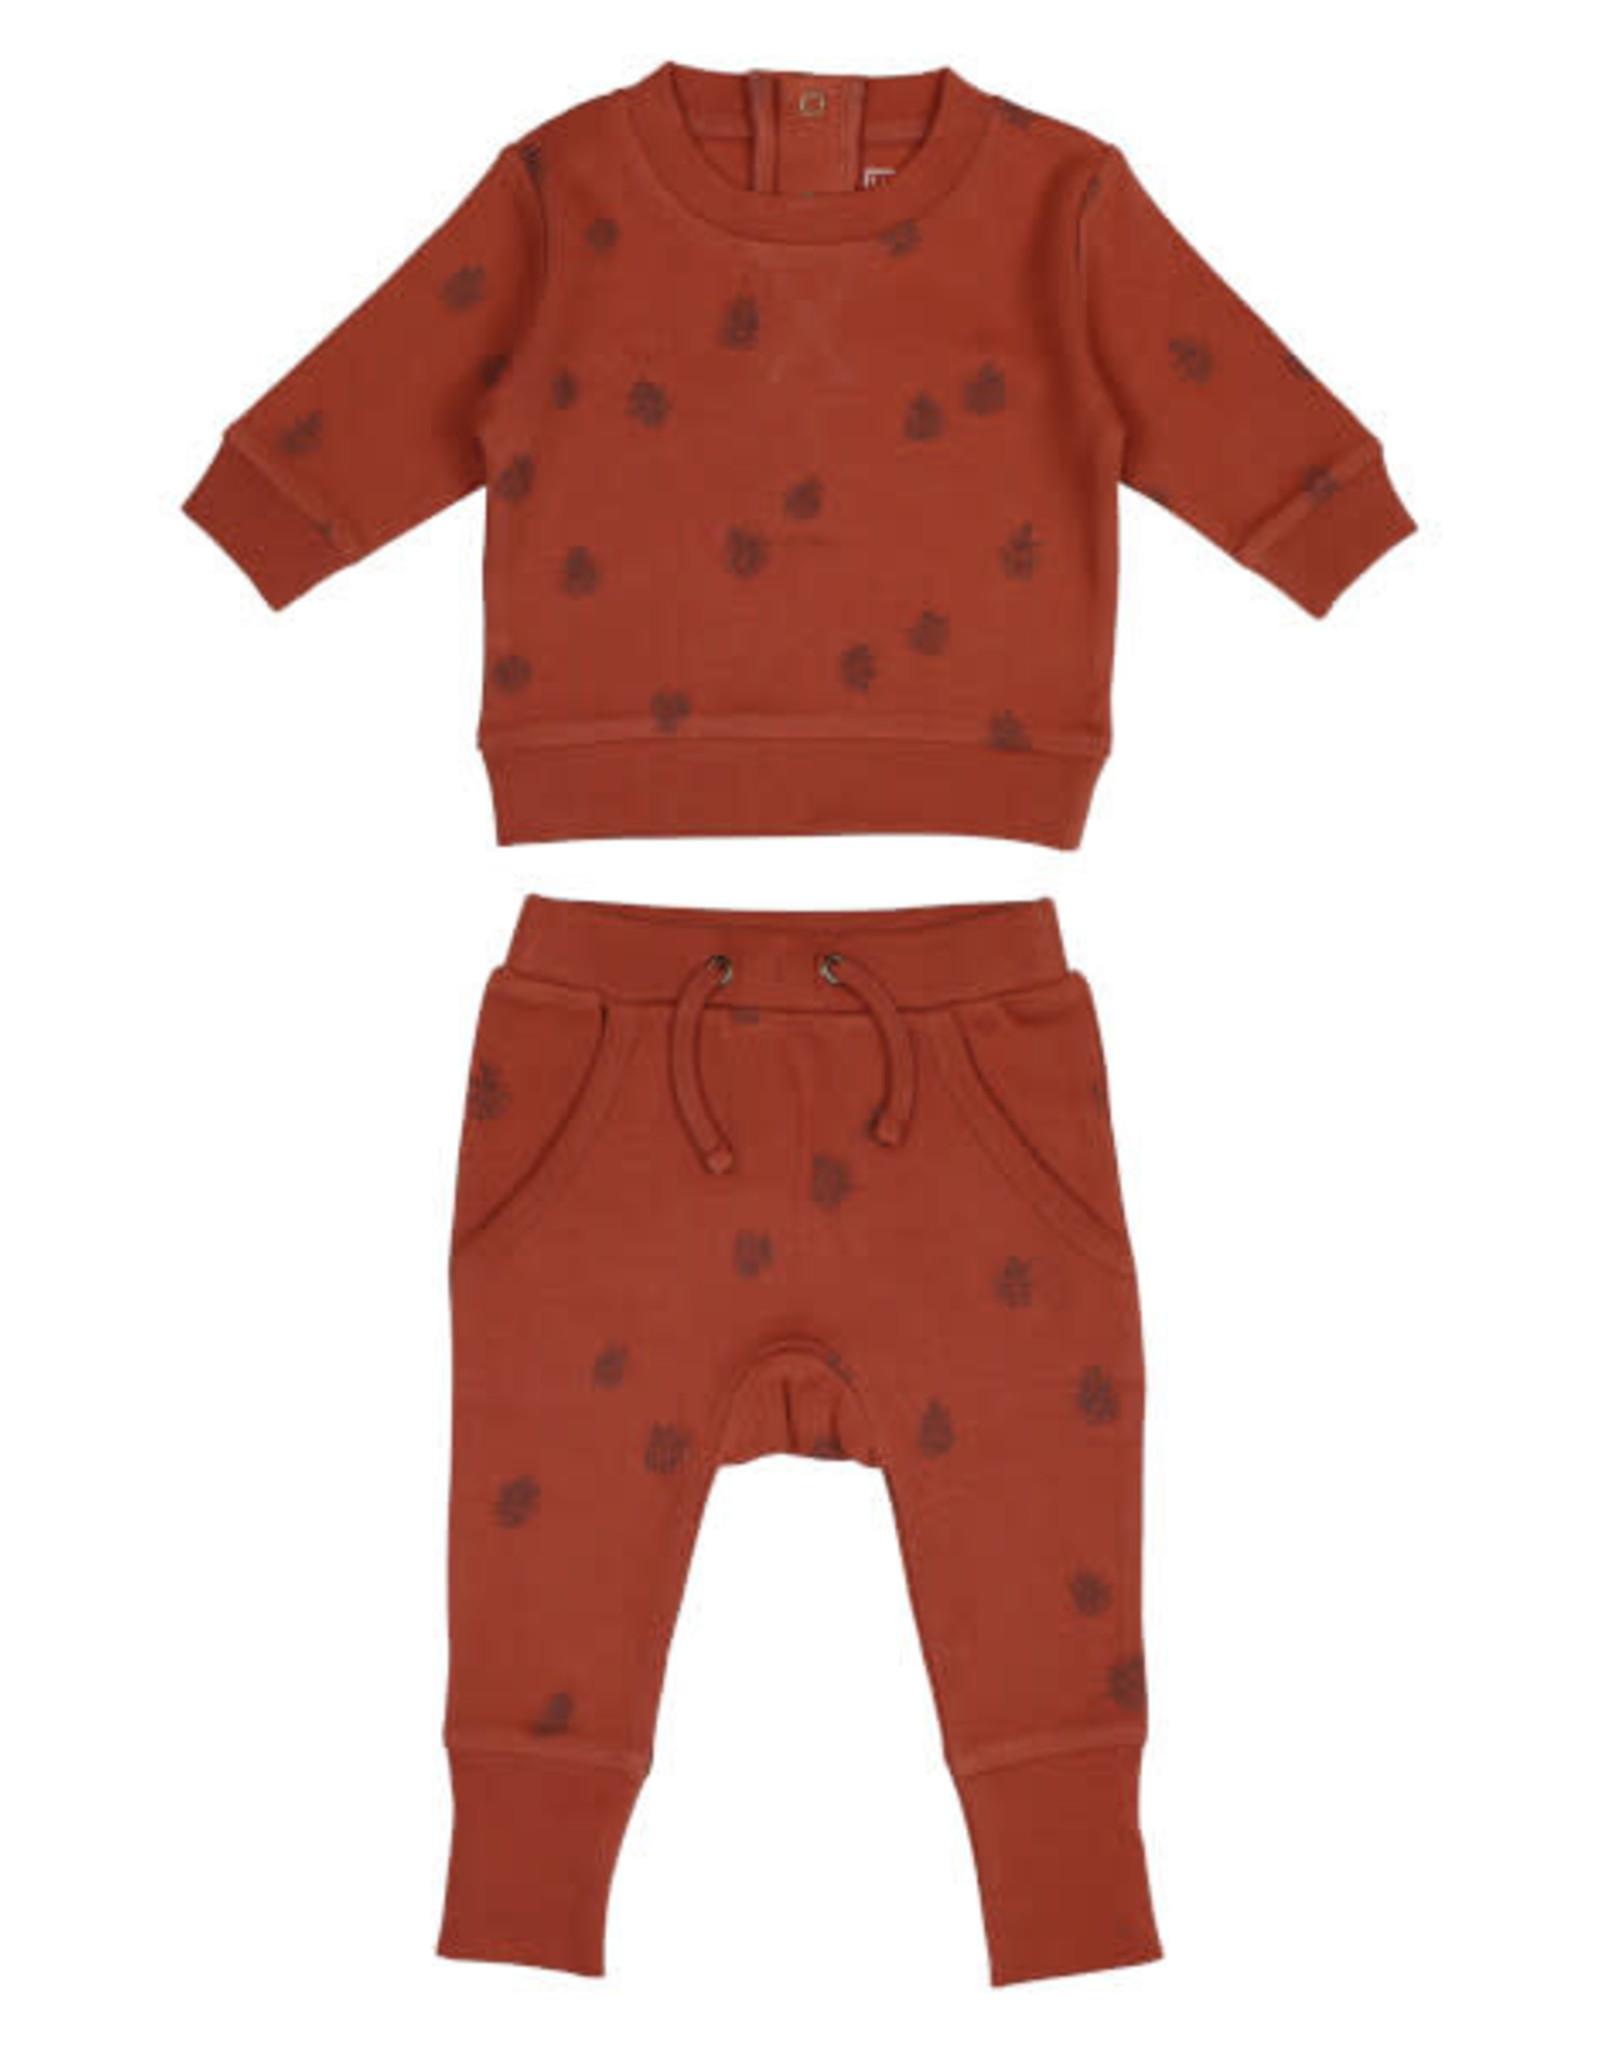 L'oved Baby Baby Cinnamon Sweatshirt & Jogger Set with Pinecone Print